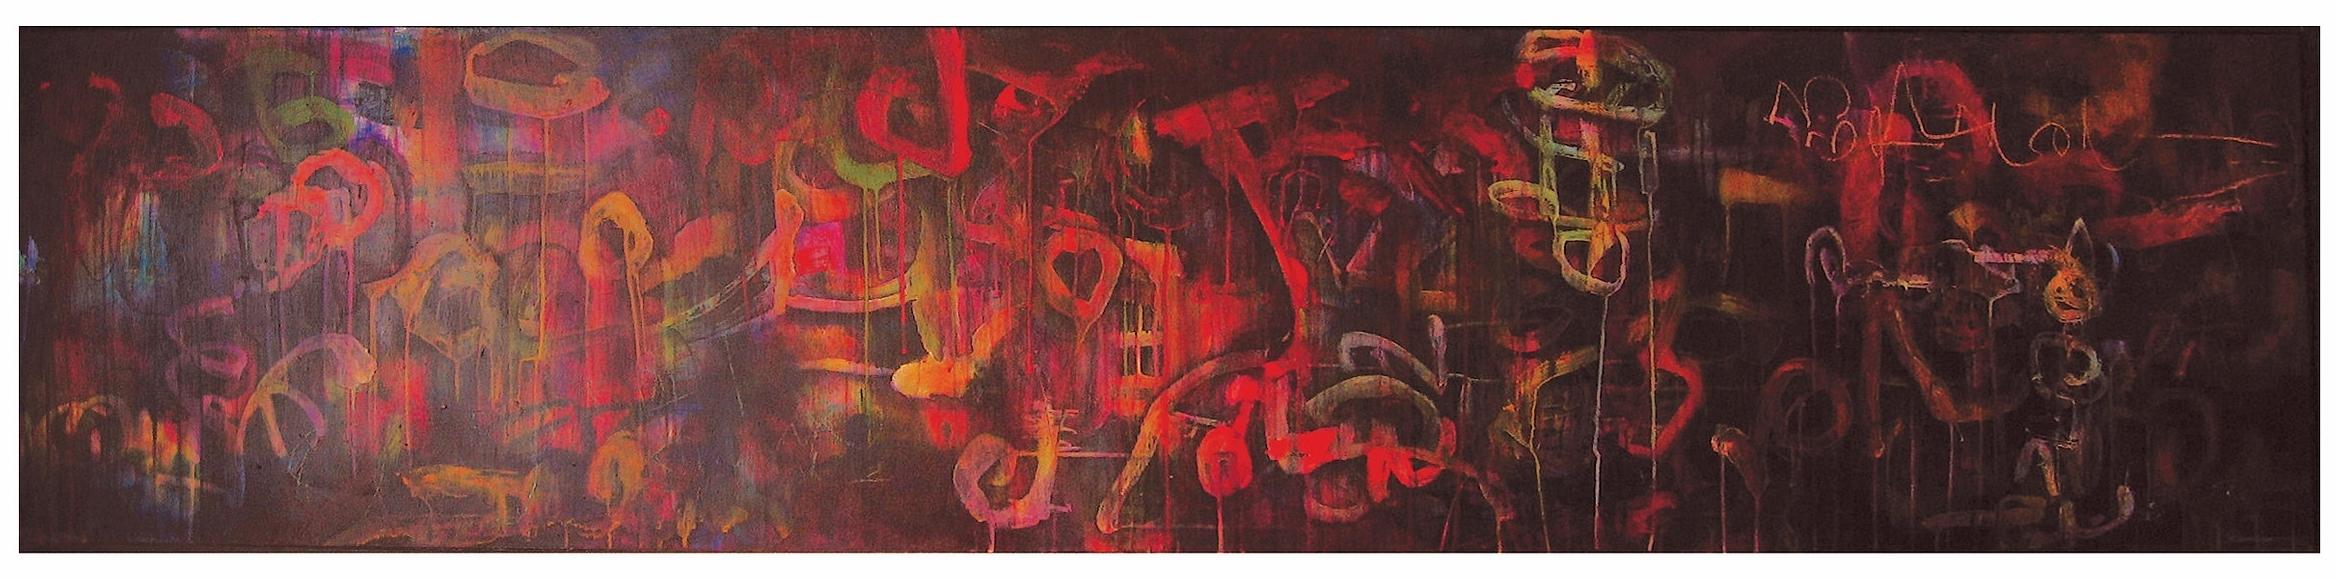 "Some Like It Hot, (Loving Jamaica), 1999  acrylic on wood panel 24""x96""x3"""